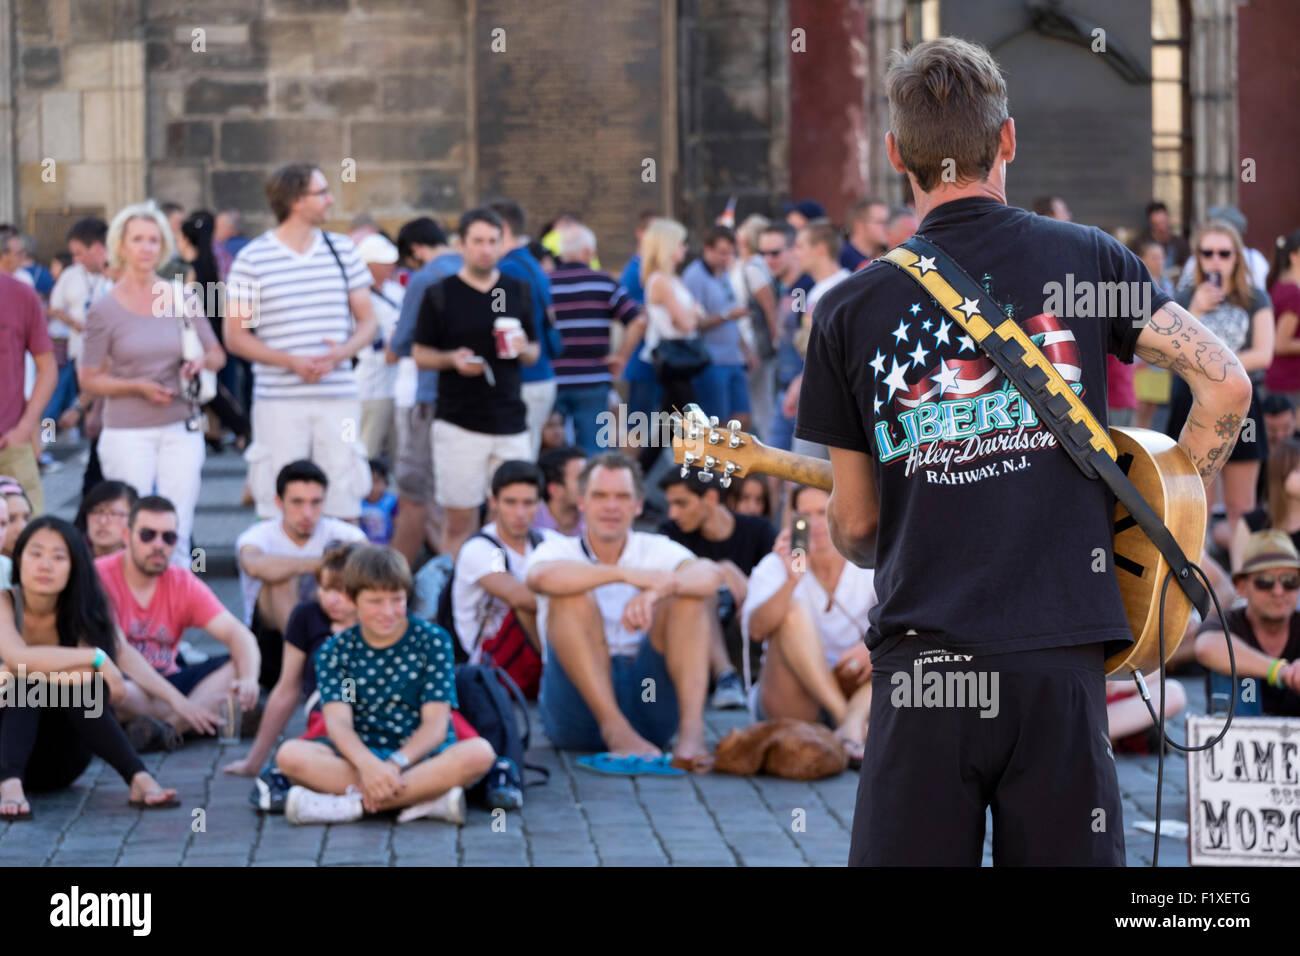 Street performer audience in Prague, Czech Republic, Europe - Stock Image